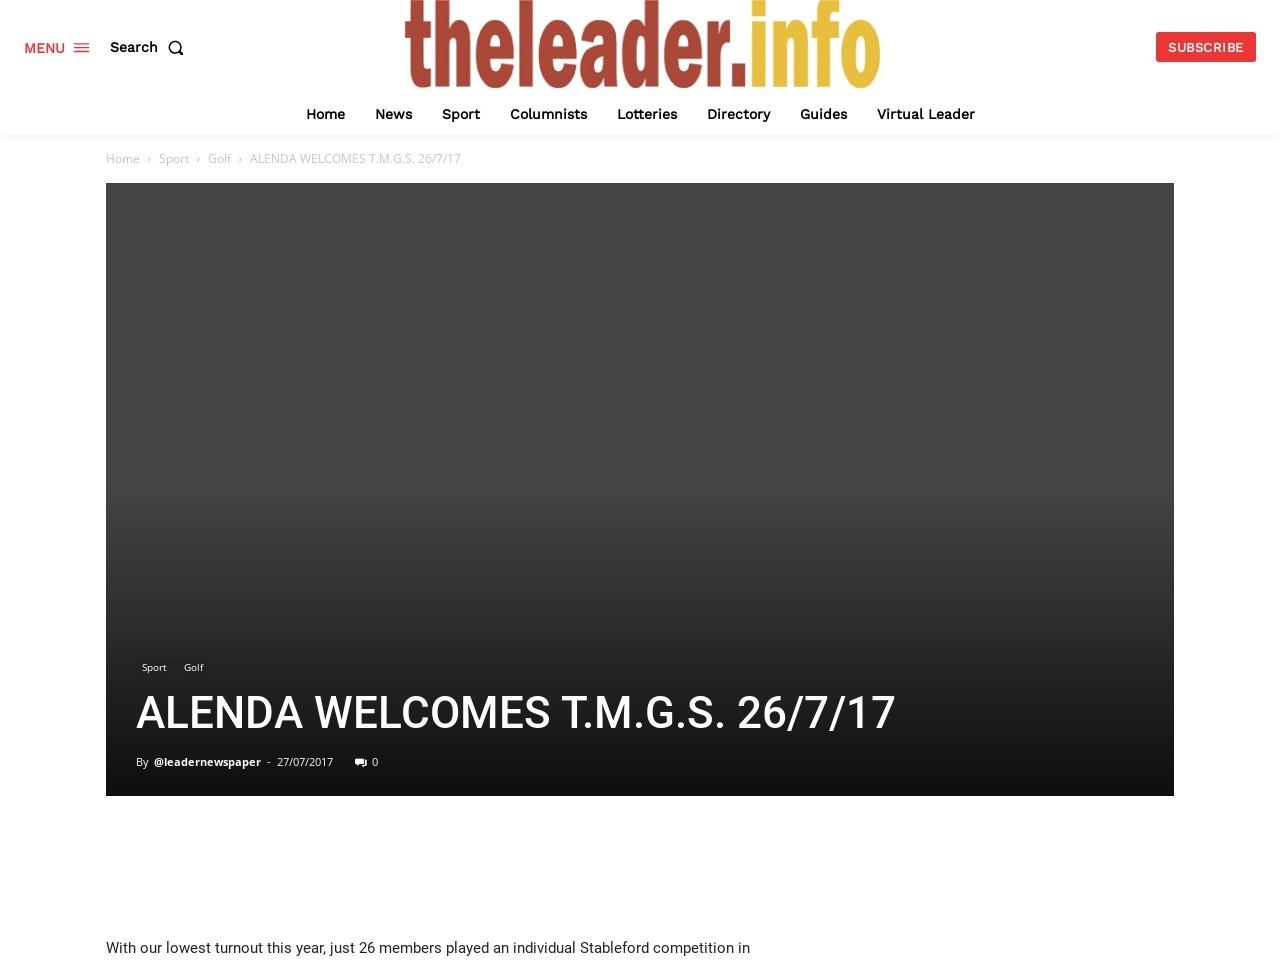 ALENDA WELCOMES T.M.G.S. 26/7/17